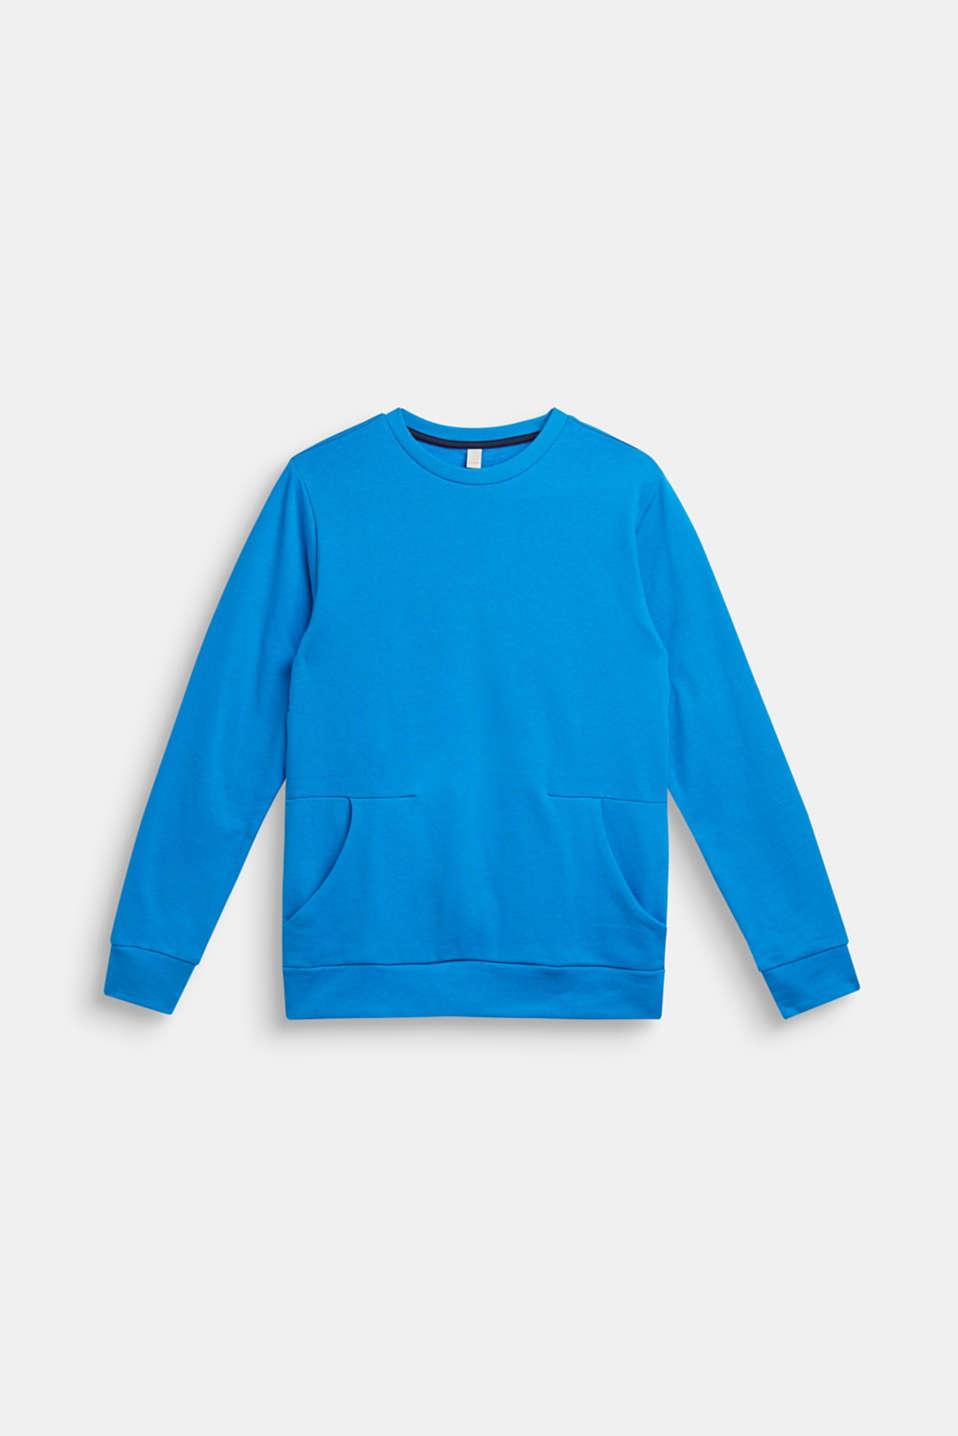 Logo print sweatshirt, 100% cotton, LCSPARROW BLUE, detail image number 1